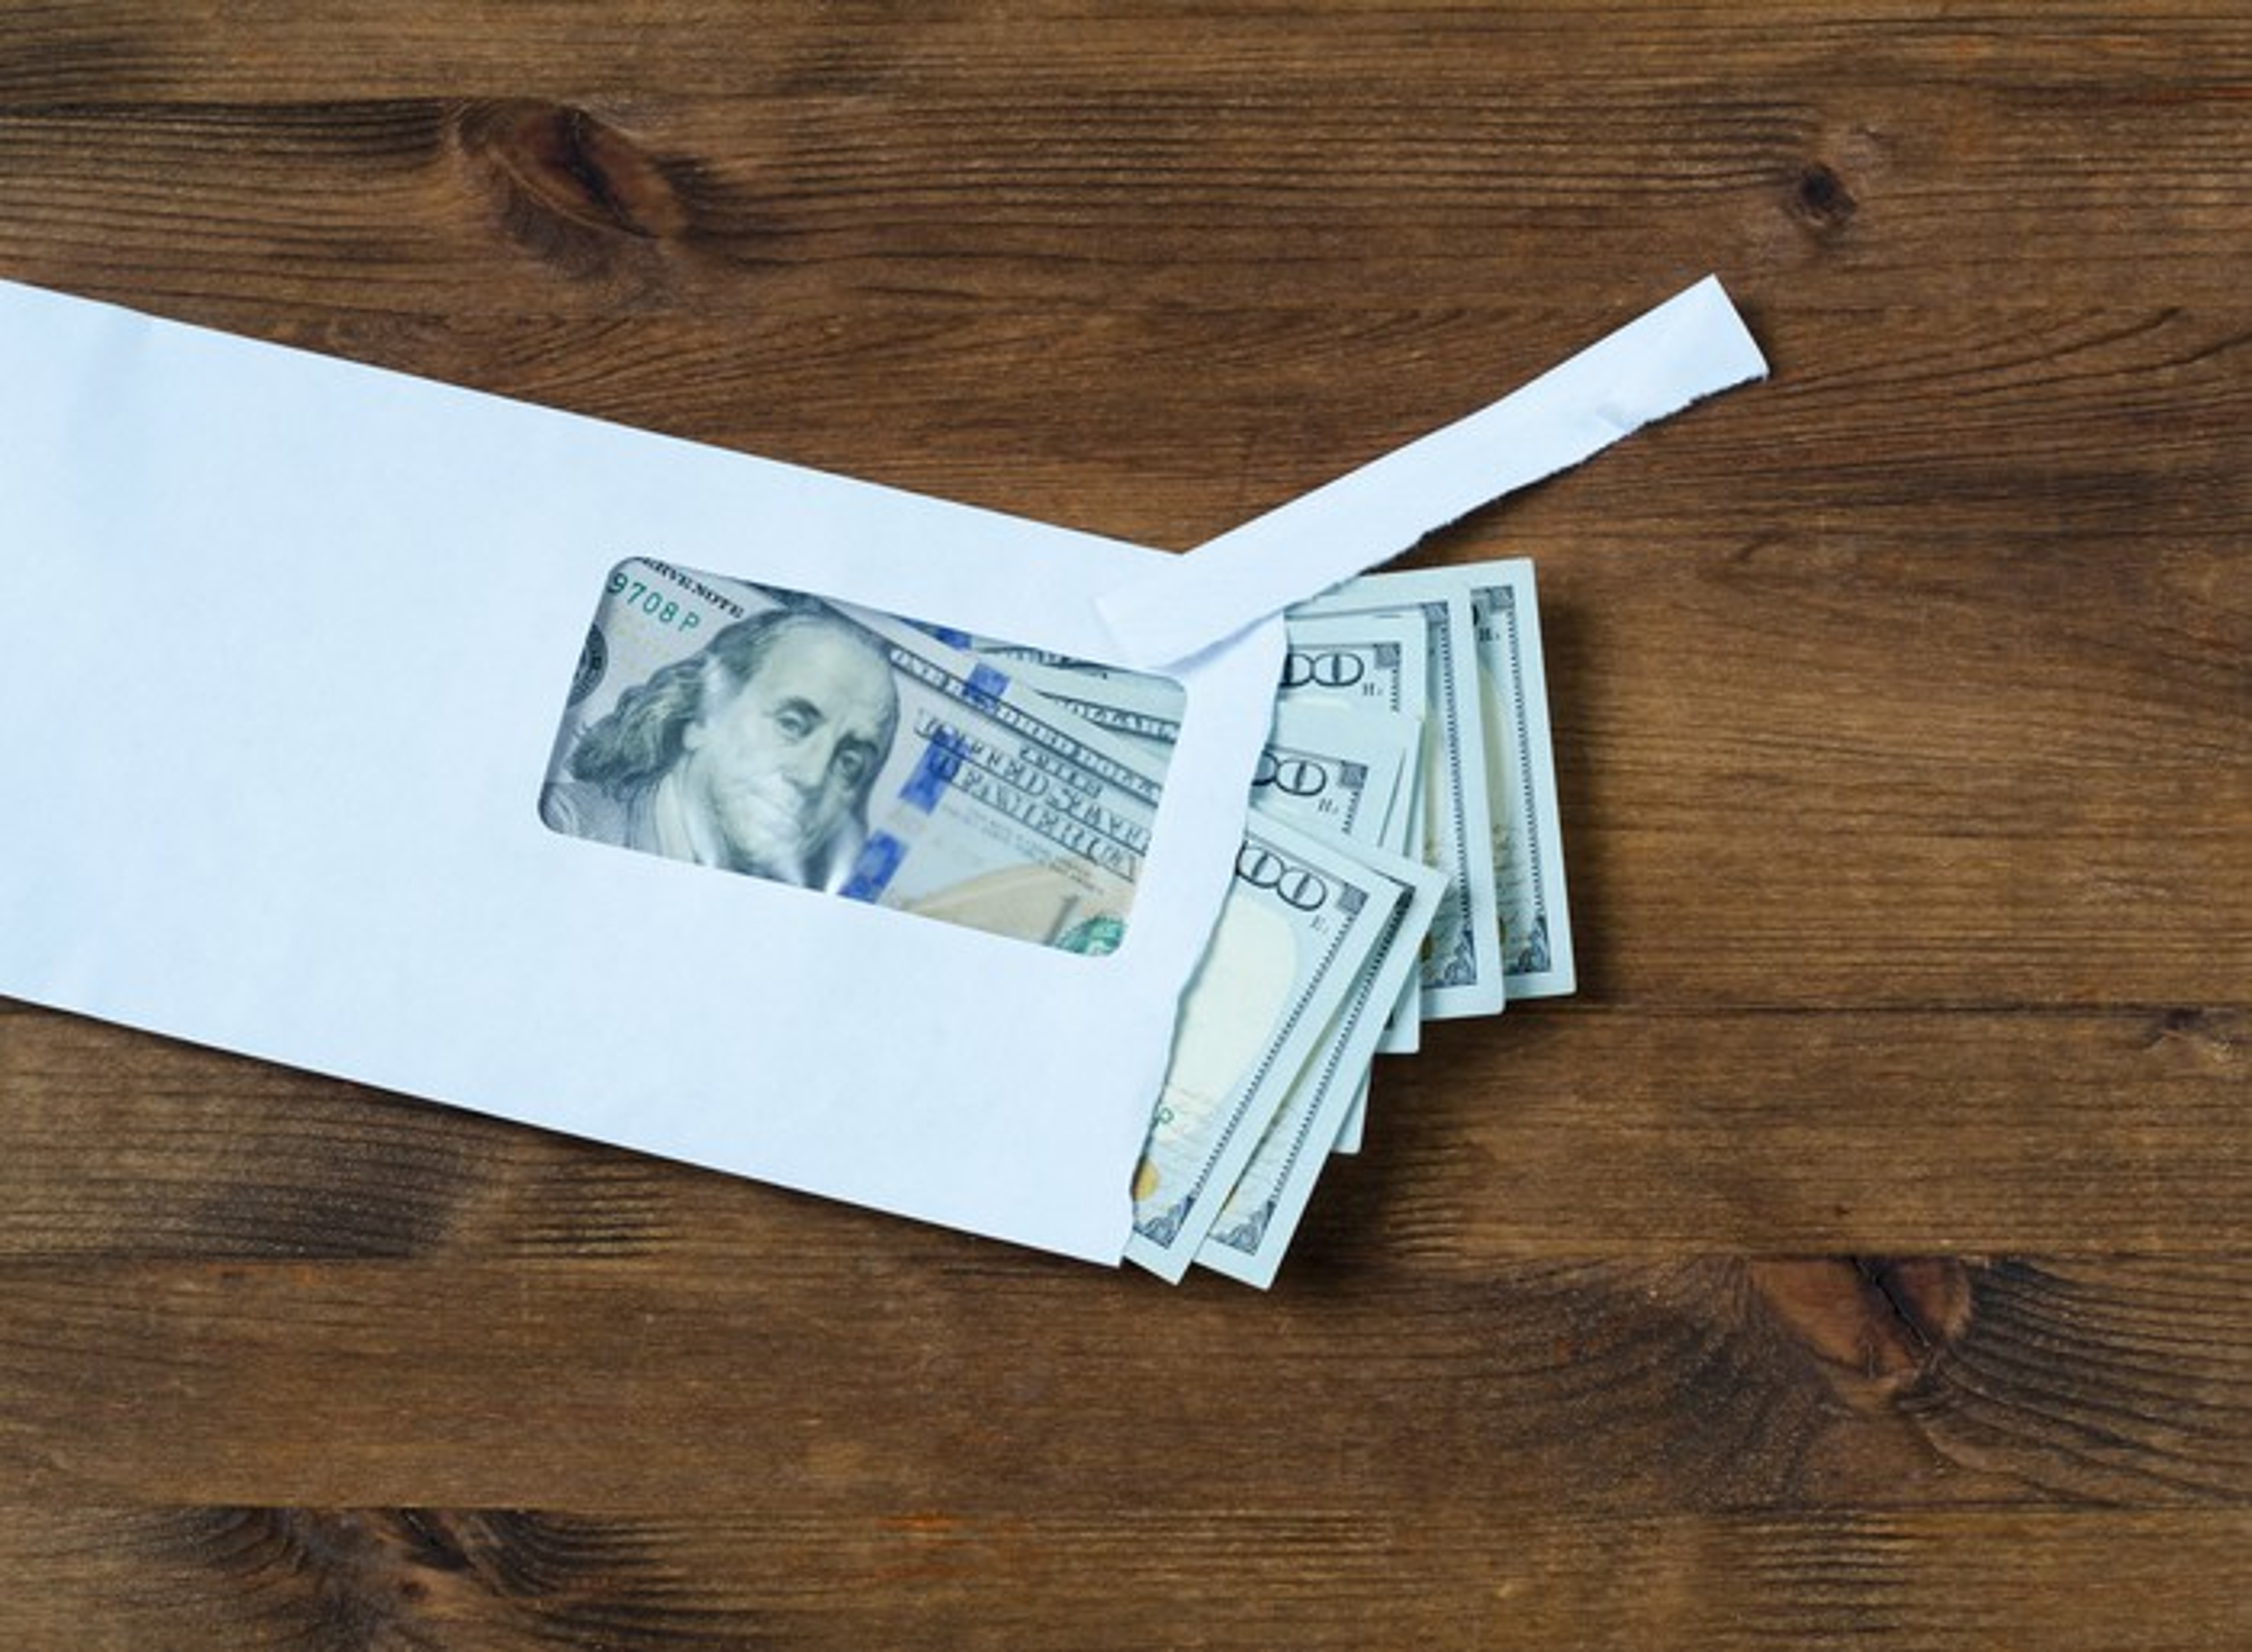 Stack of hundred dollar bills in an envelope.